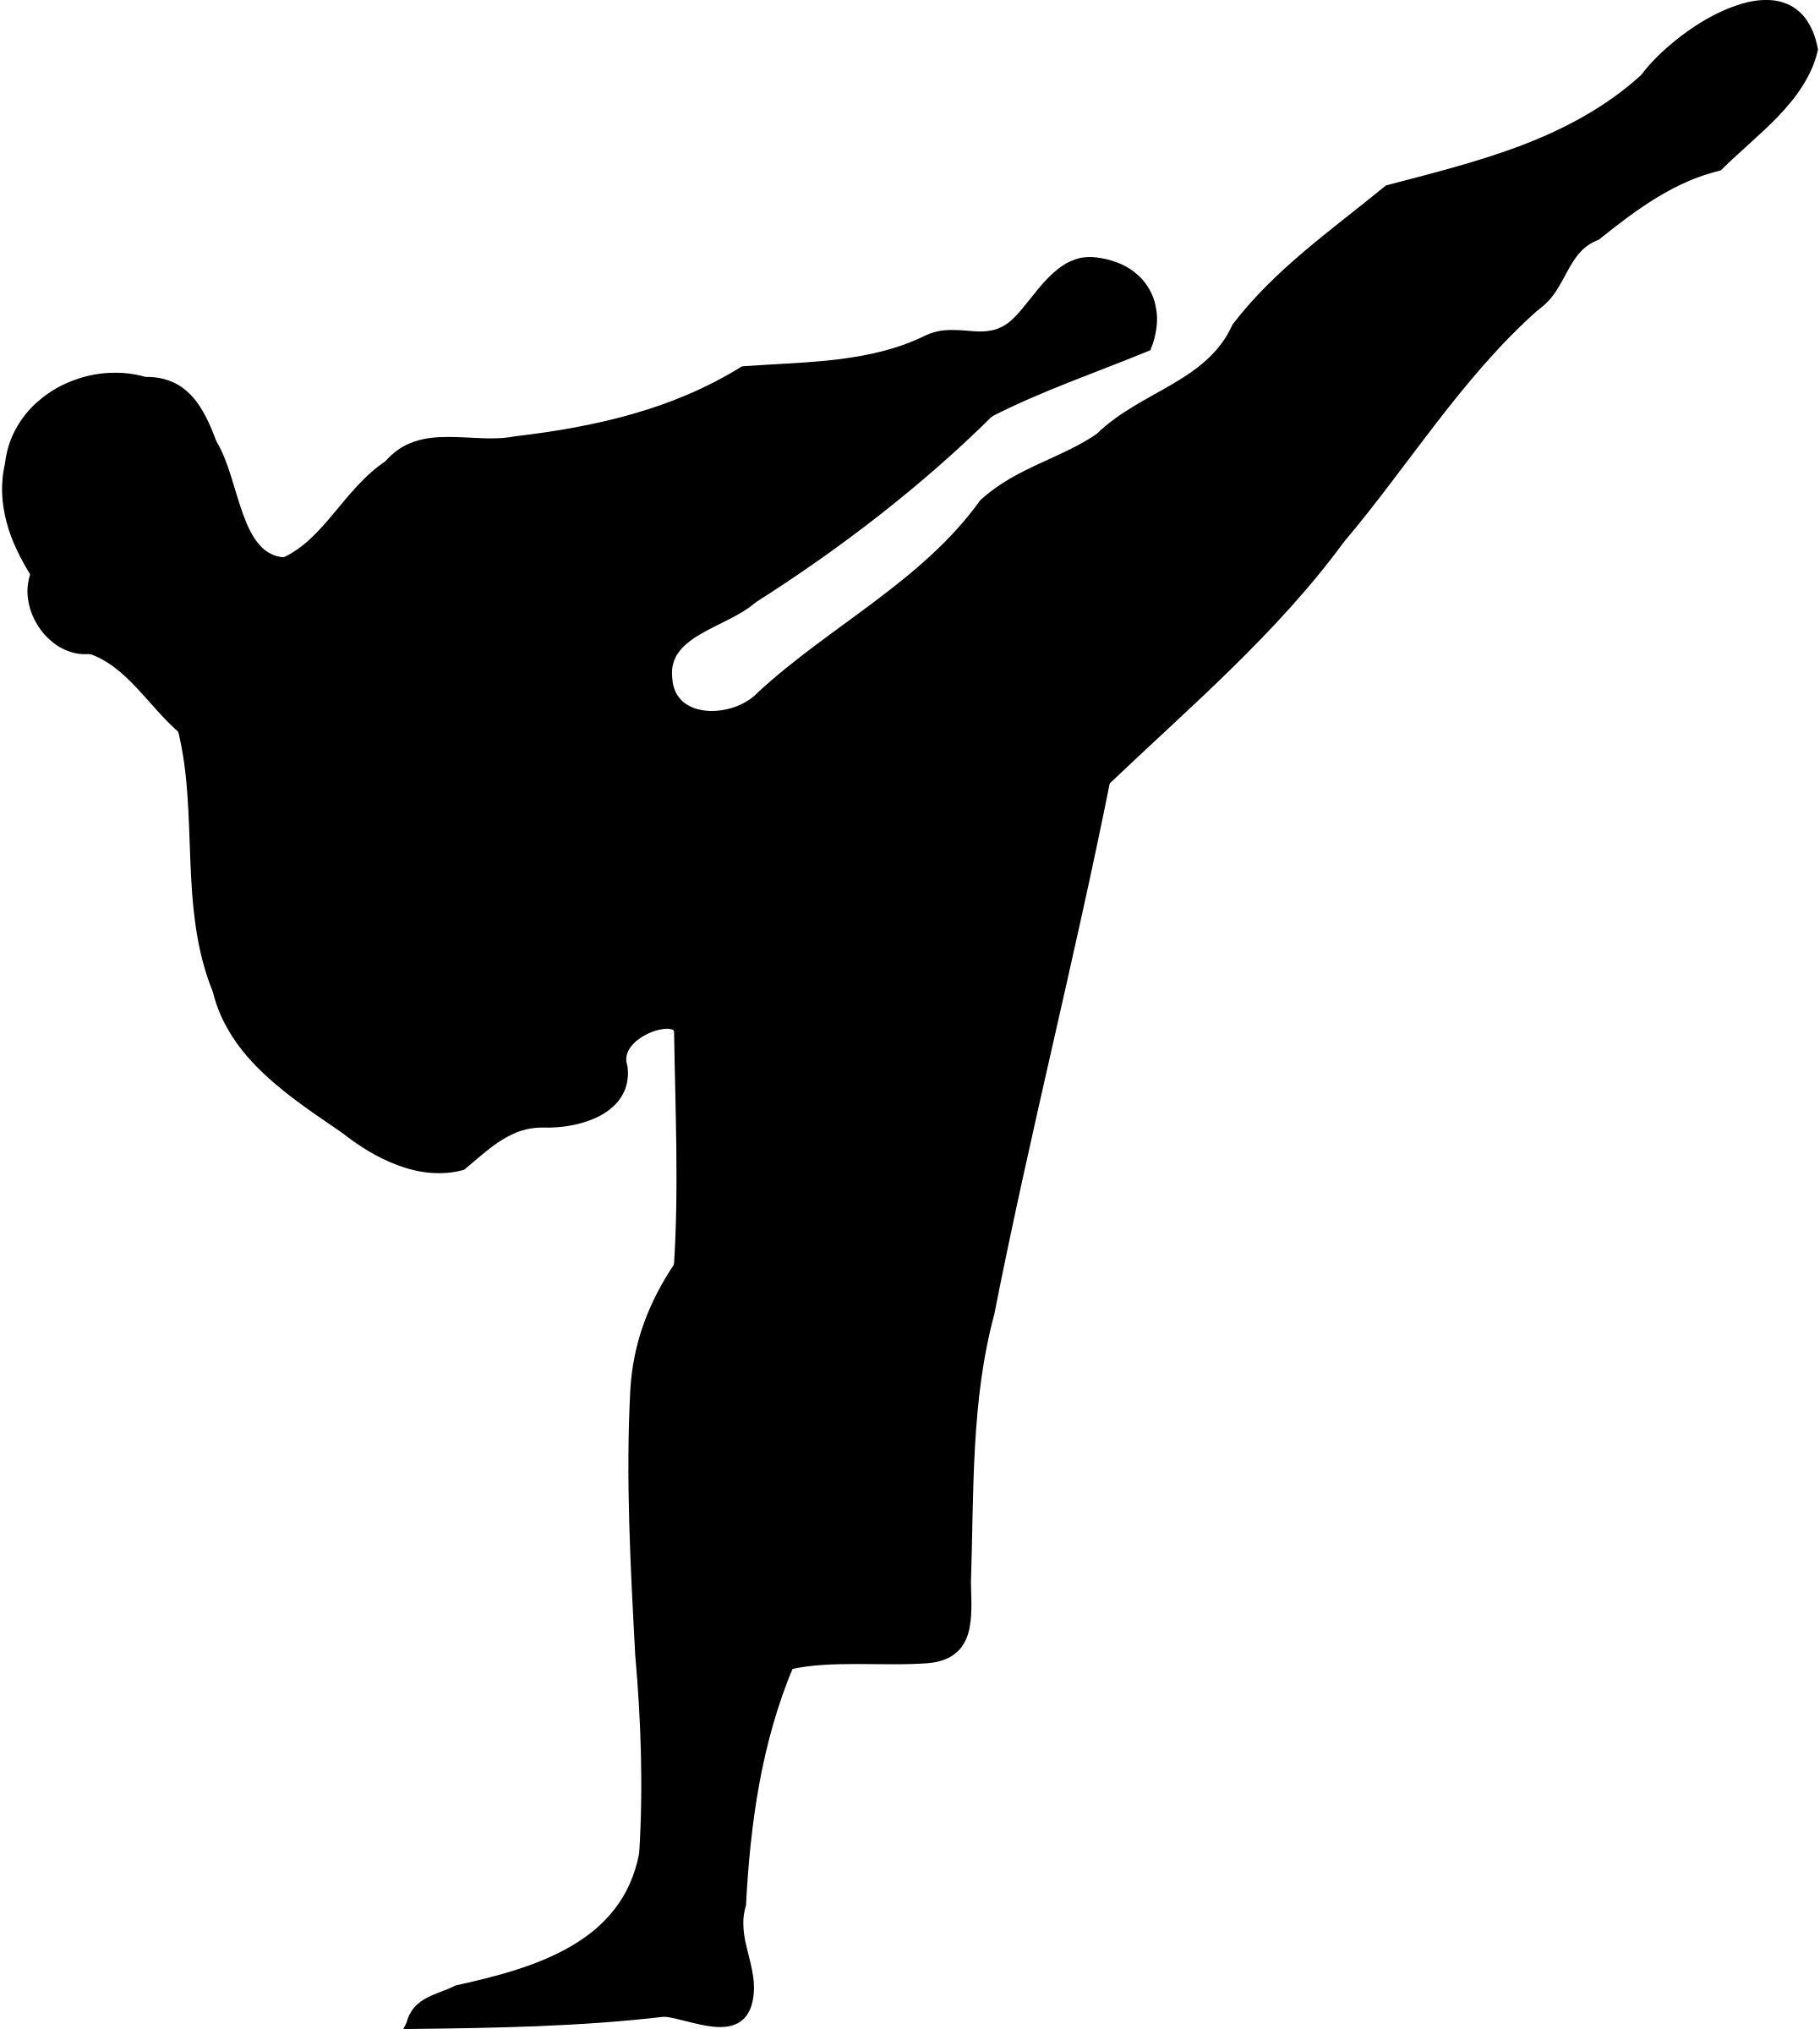 karate-clip-art-karate silhouette pngBlack Karate Cartoon